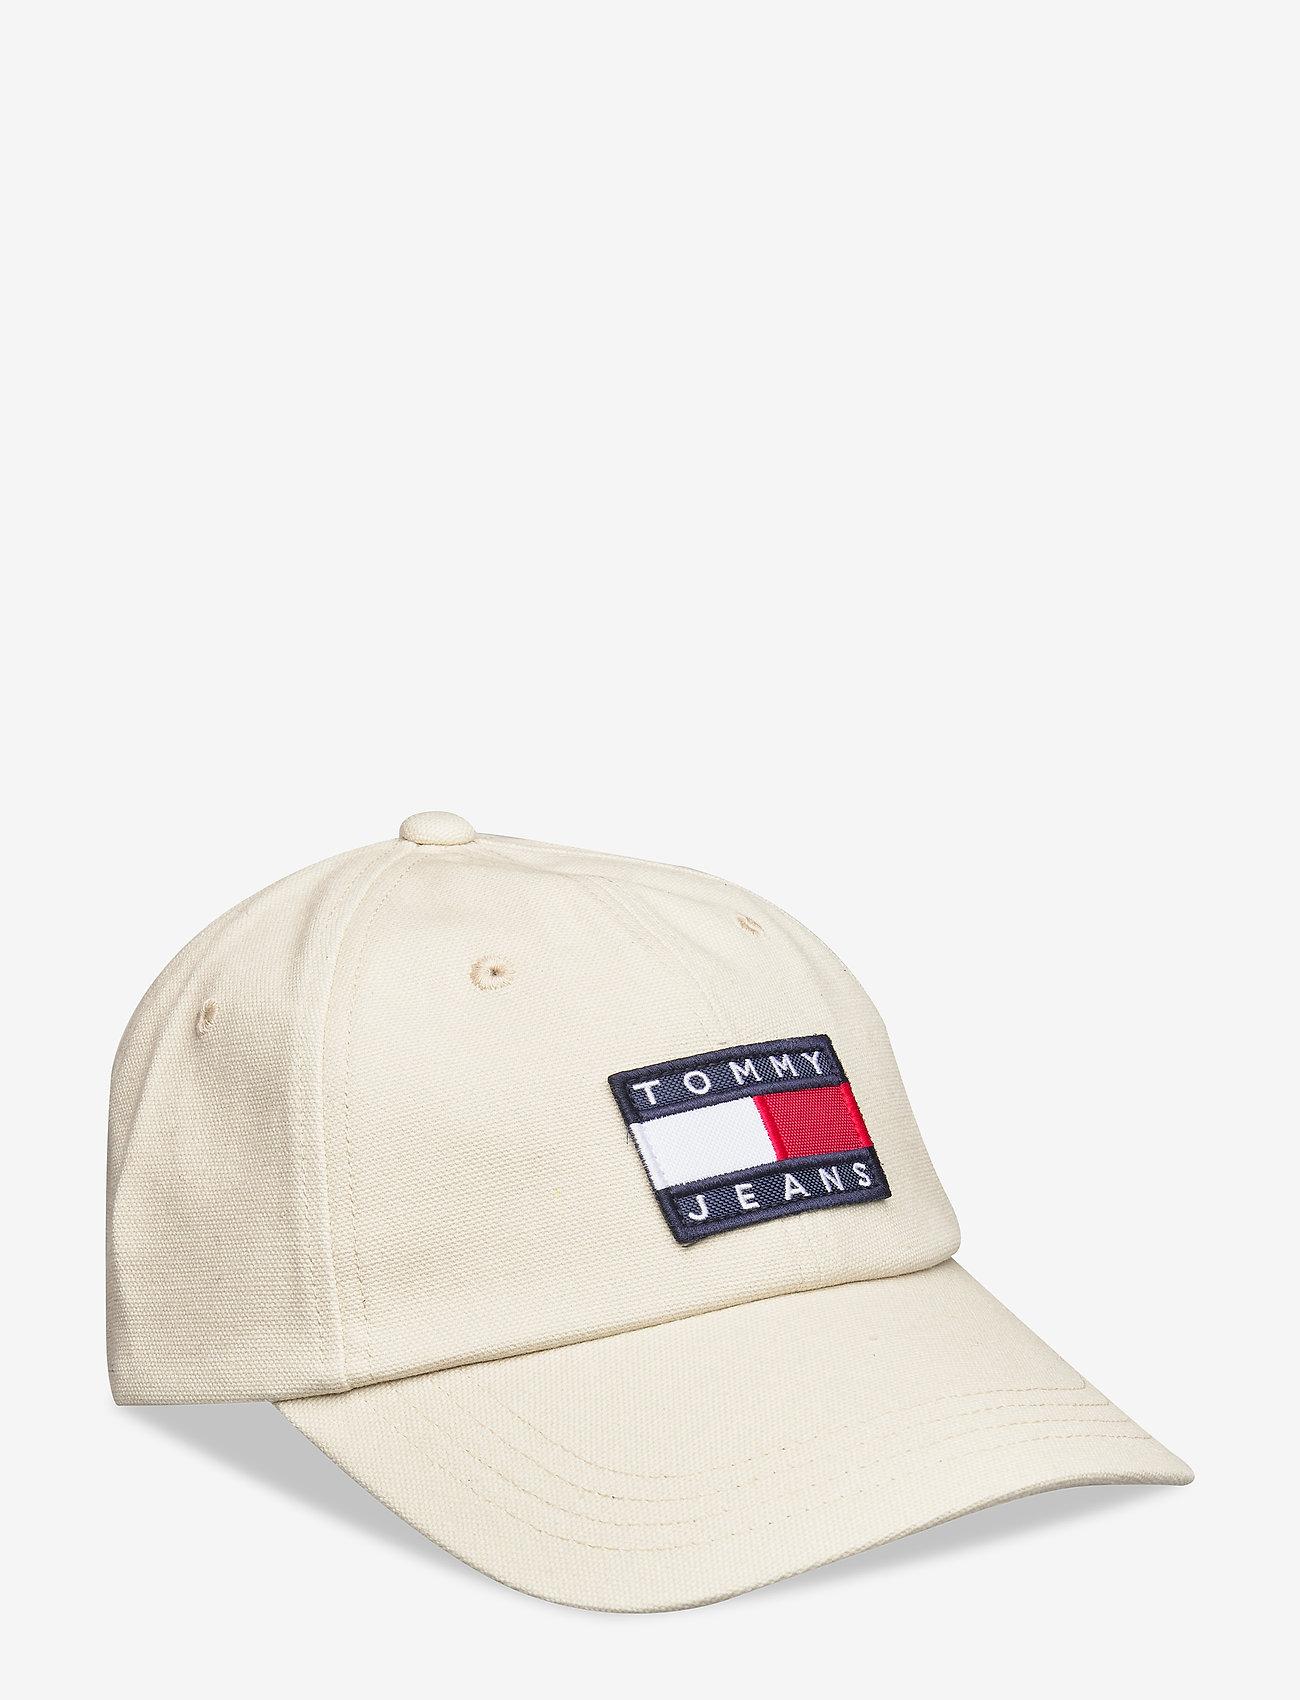 Tommy Hilfiger - TJM HERITAGE CAP - casquettes - desert tan - 0